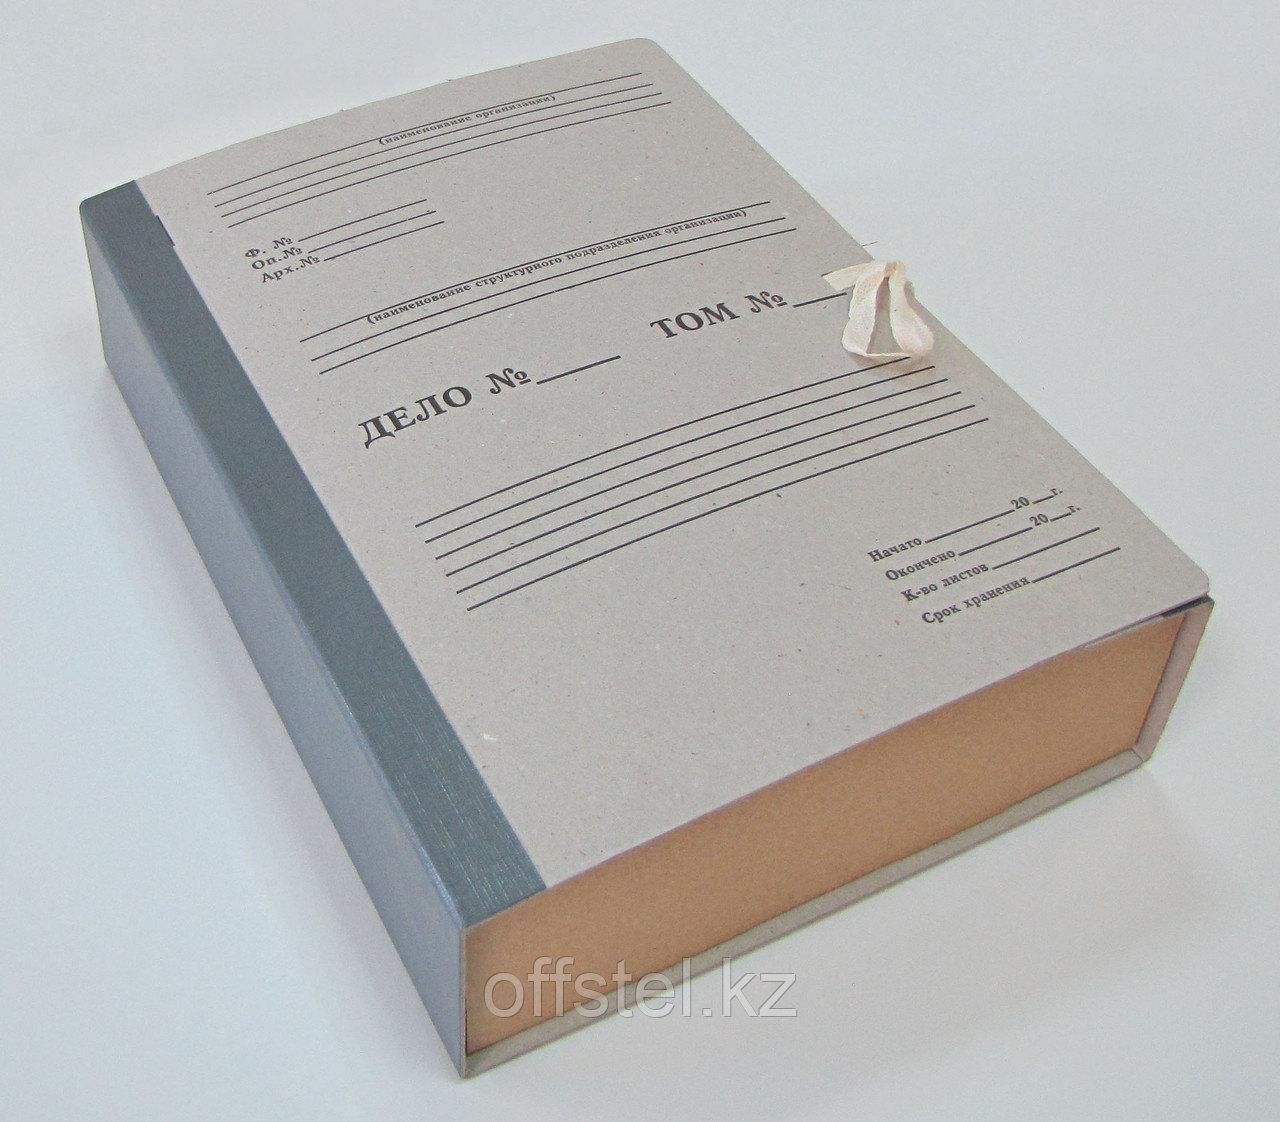 Папка из переплетного картона корешок покрыт бумвинилом (Арт.1540к)